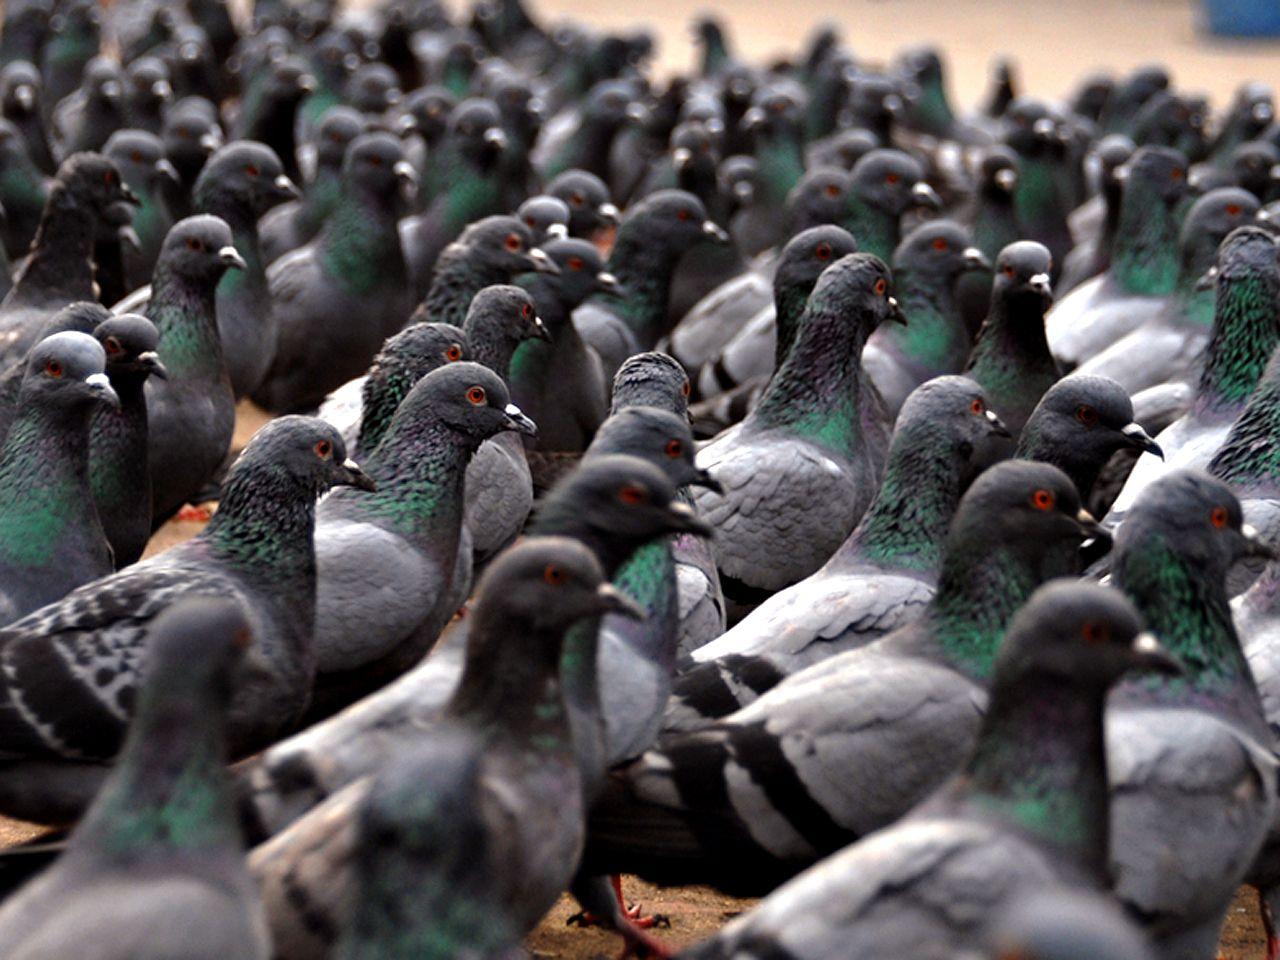 Flock Of Pigeons Wallpaper 1280x960